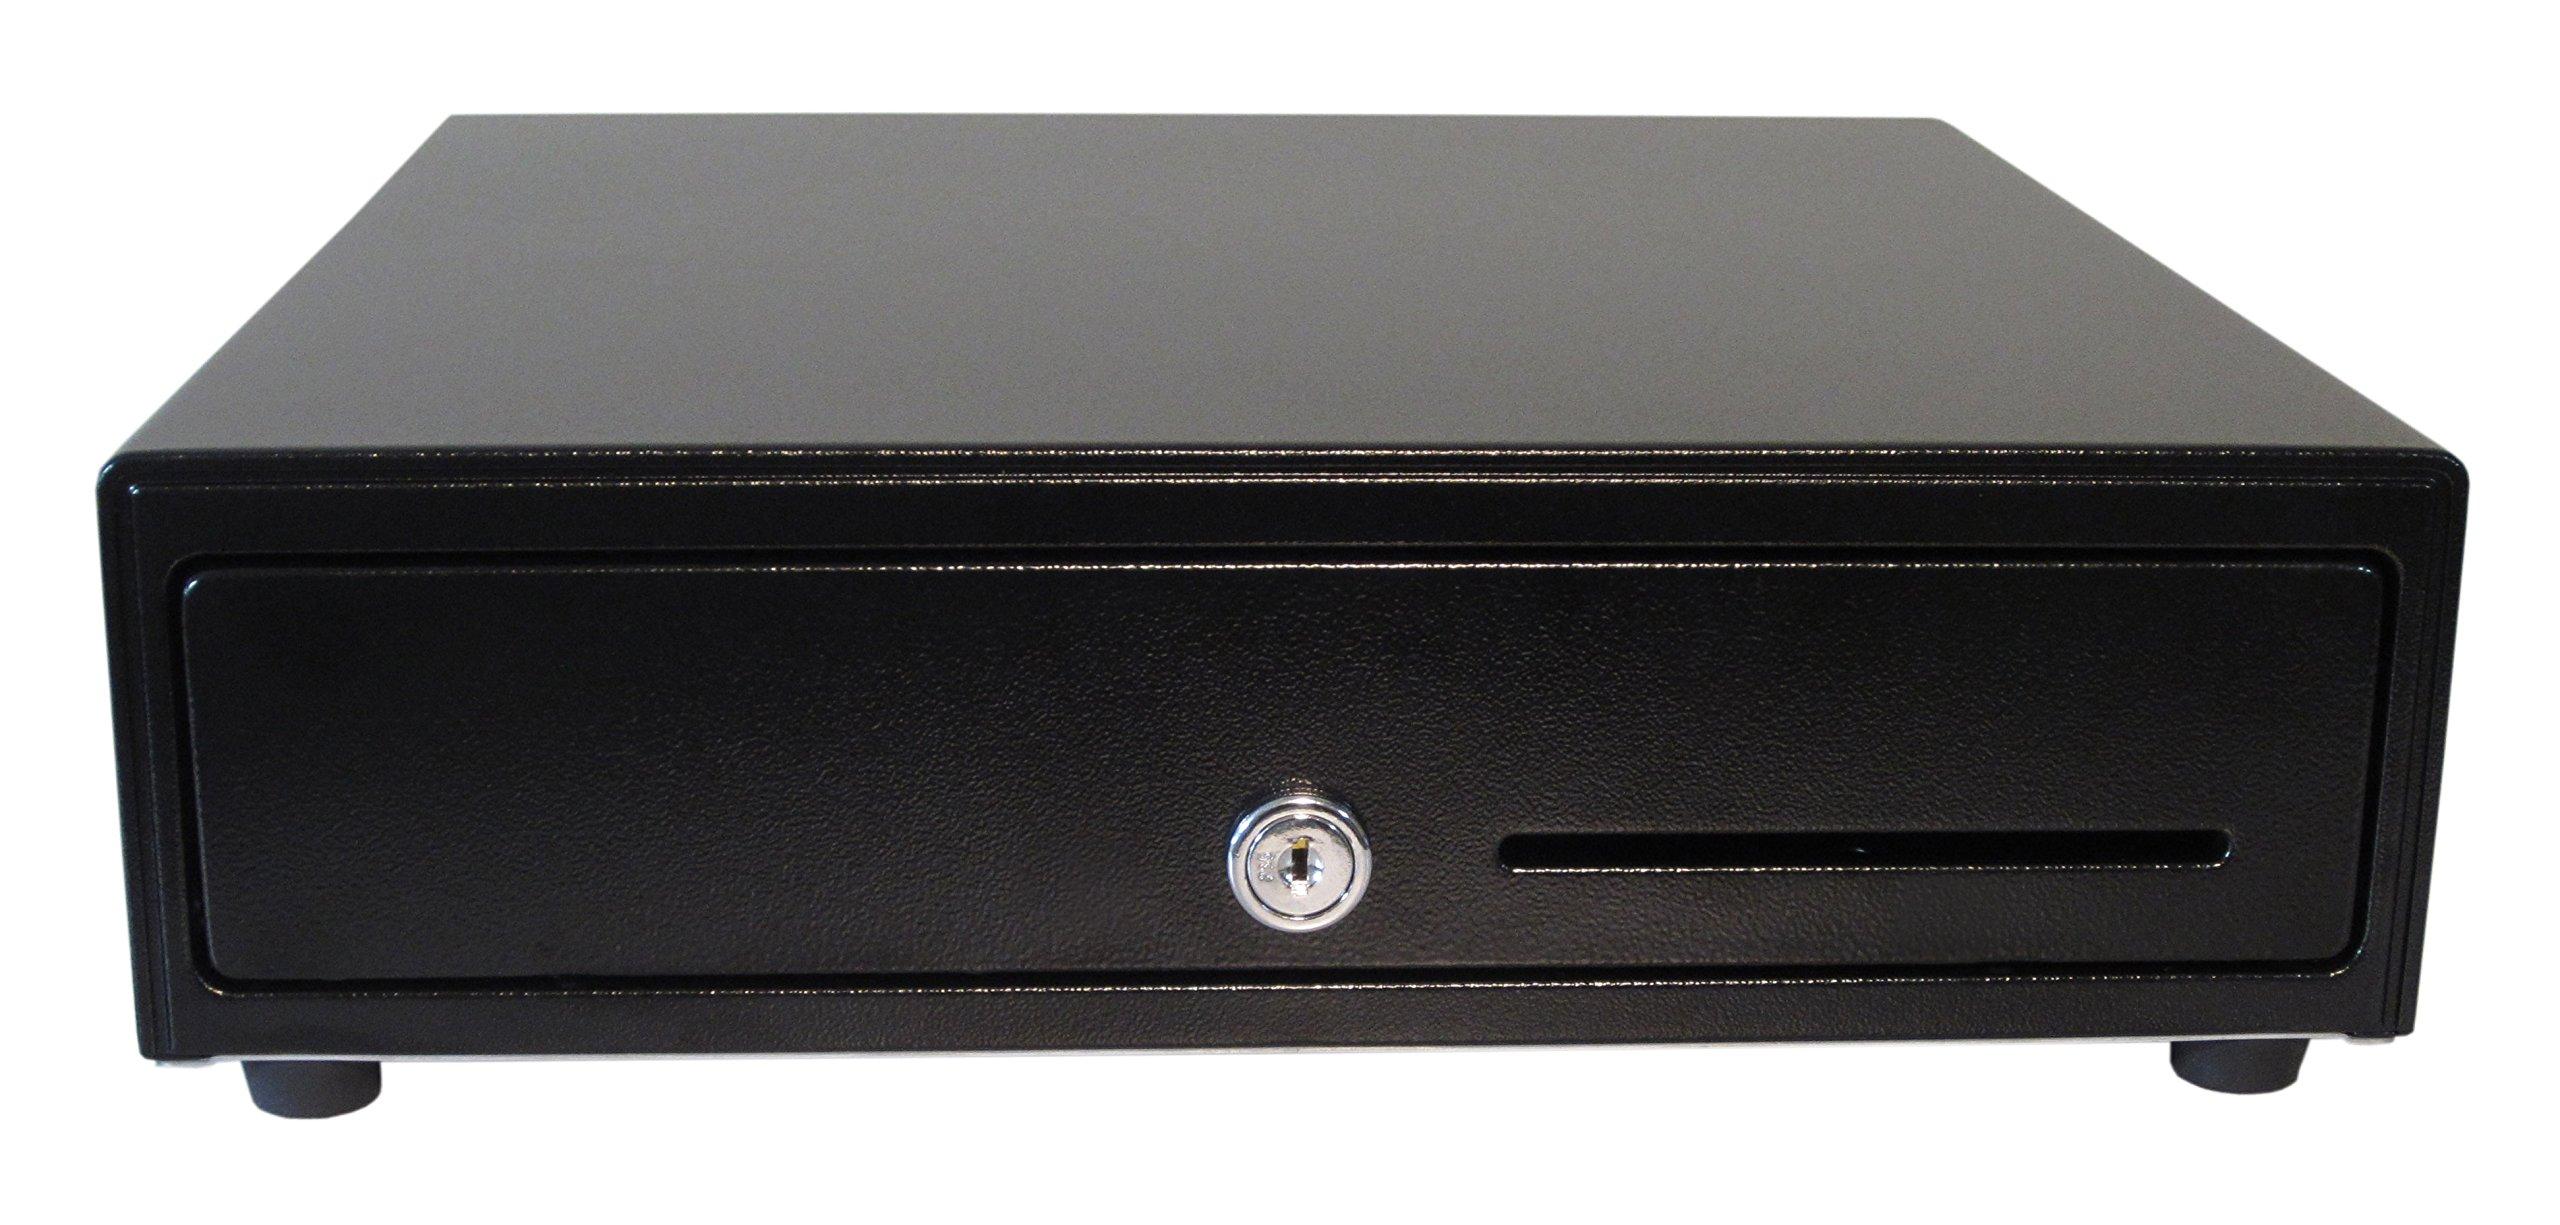 APG VB320-BL1313-B27 Vasario Series Standard-Duty Printer Cash Drawer with MultiPRO 320 Interface, 24V, 13.1'' x 13.1'' x 3.93'', Black